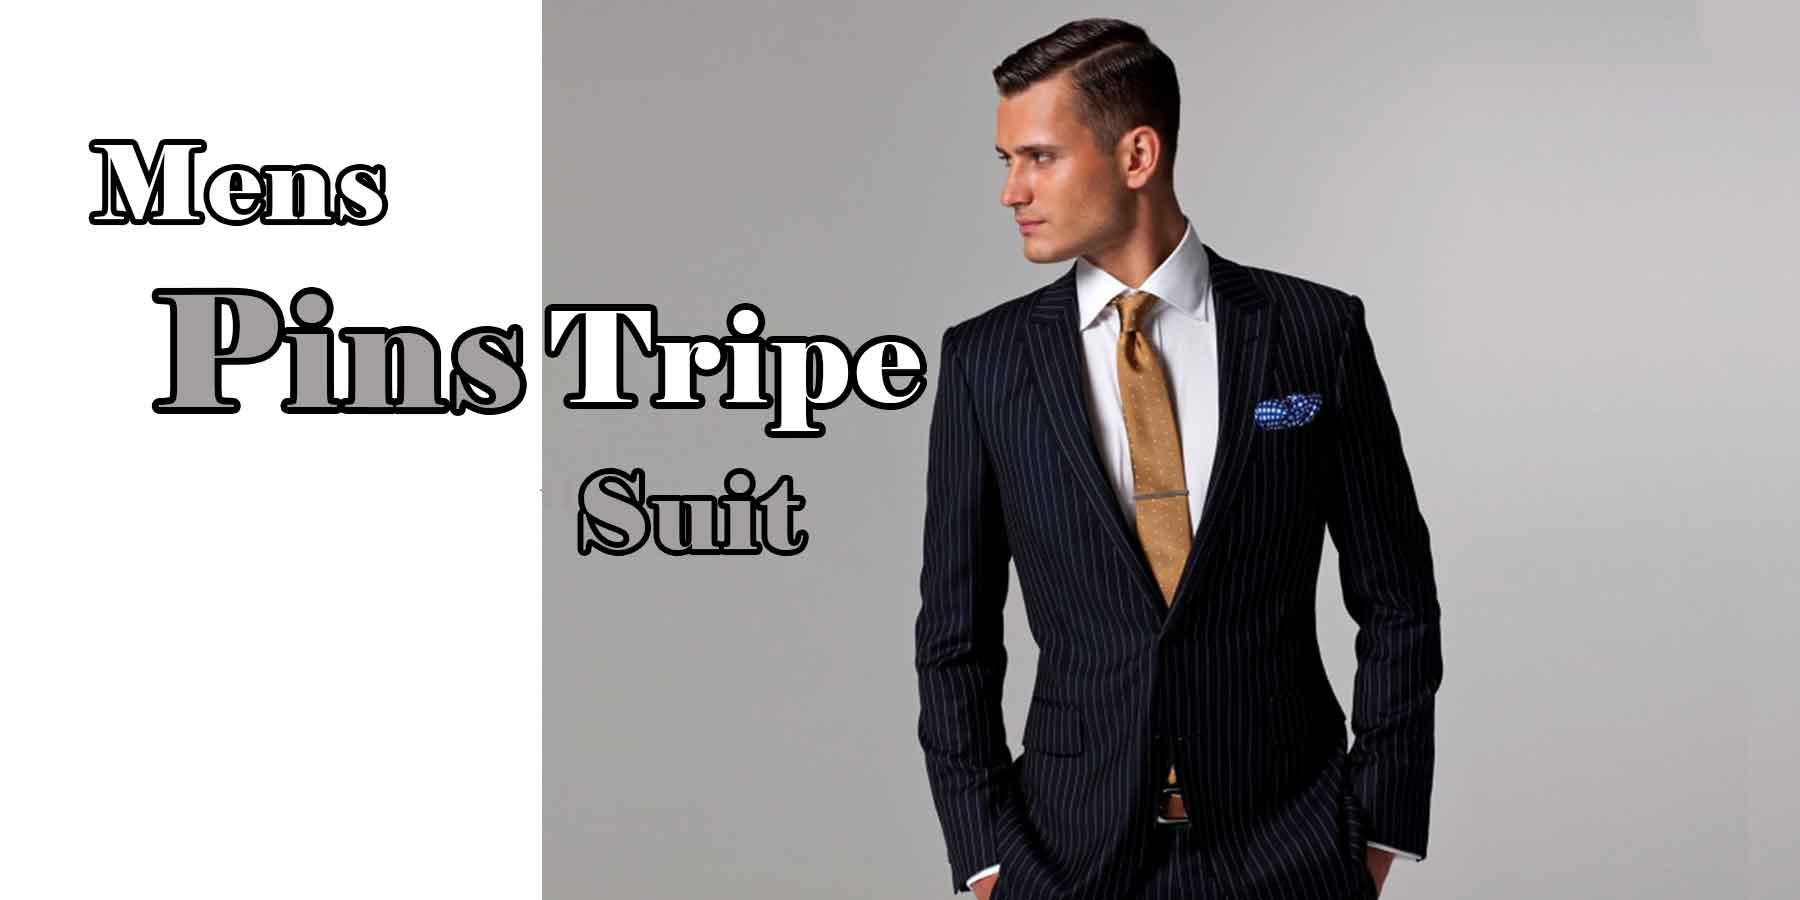 Mens-Pinstripe-Suit